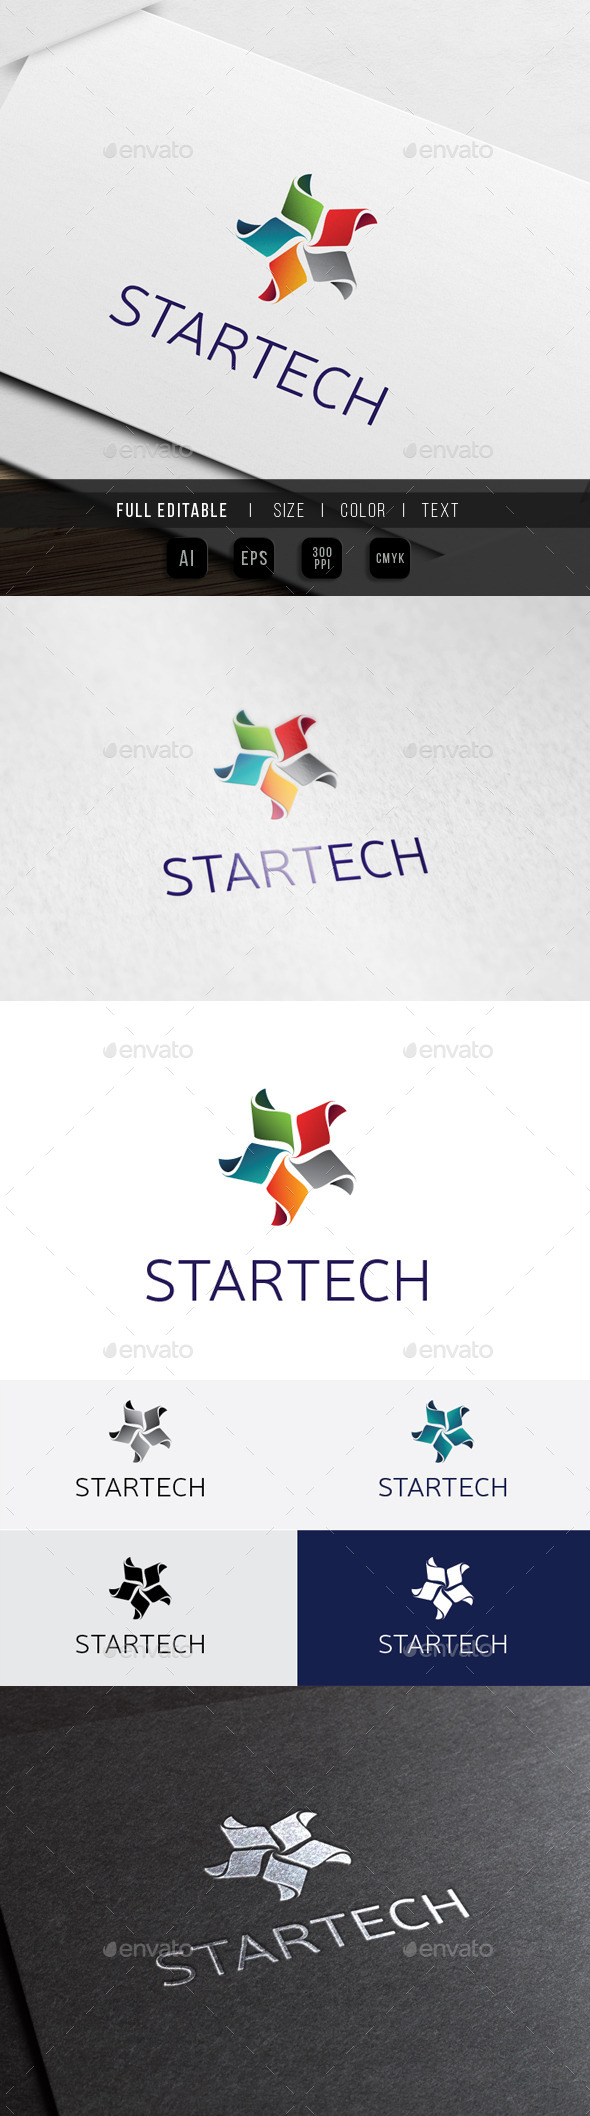 Star Media Technology - Creative Studio